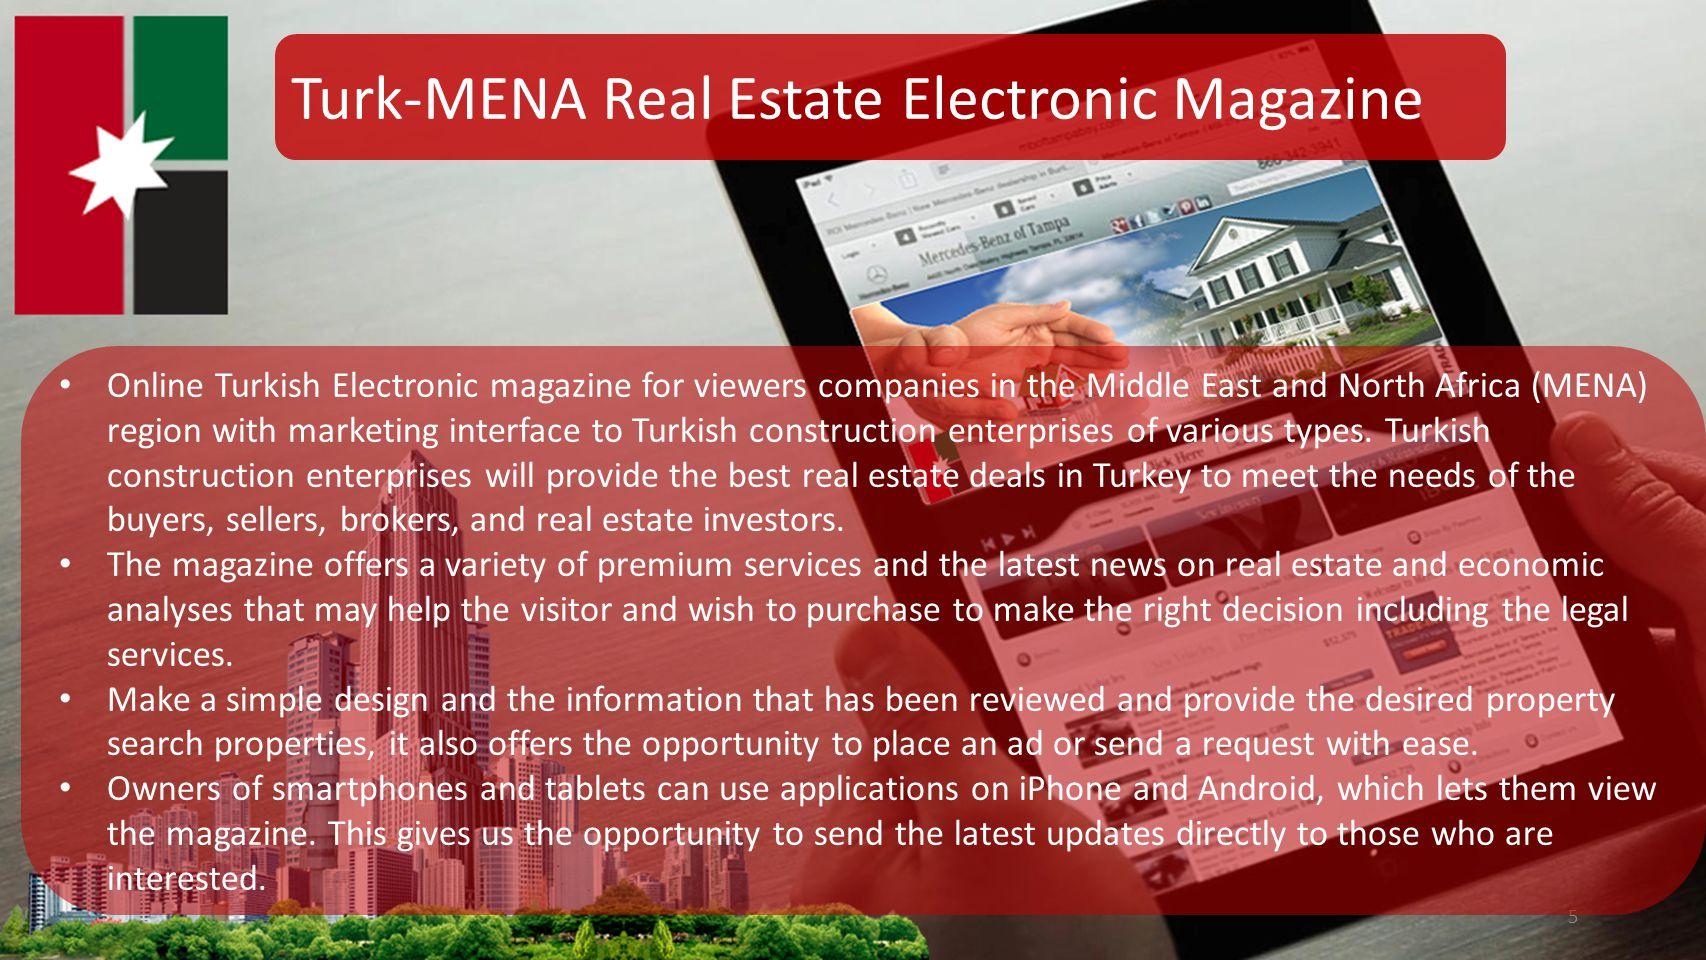 Turk-MENA Real Estate Electronic Magazine